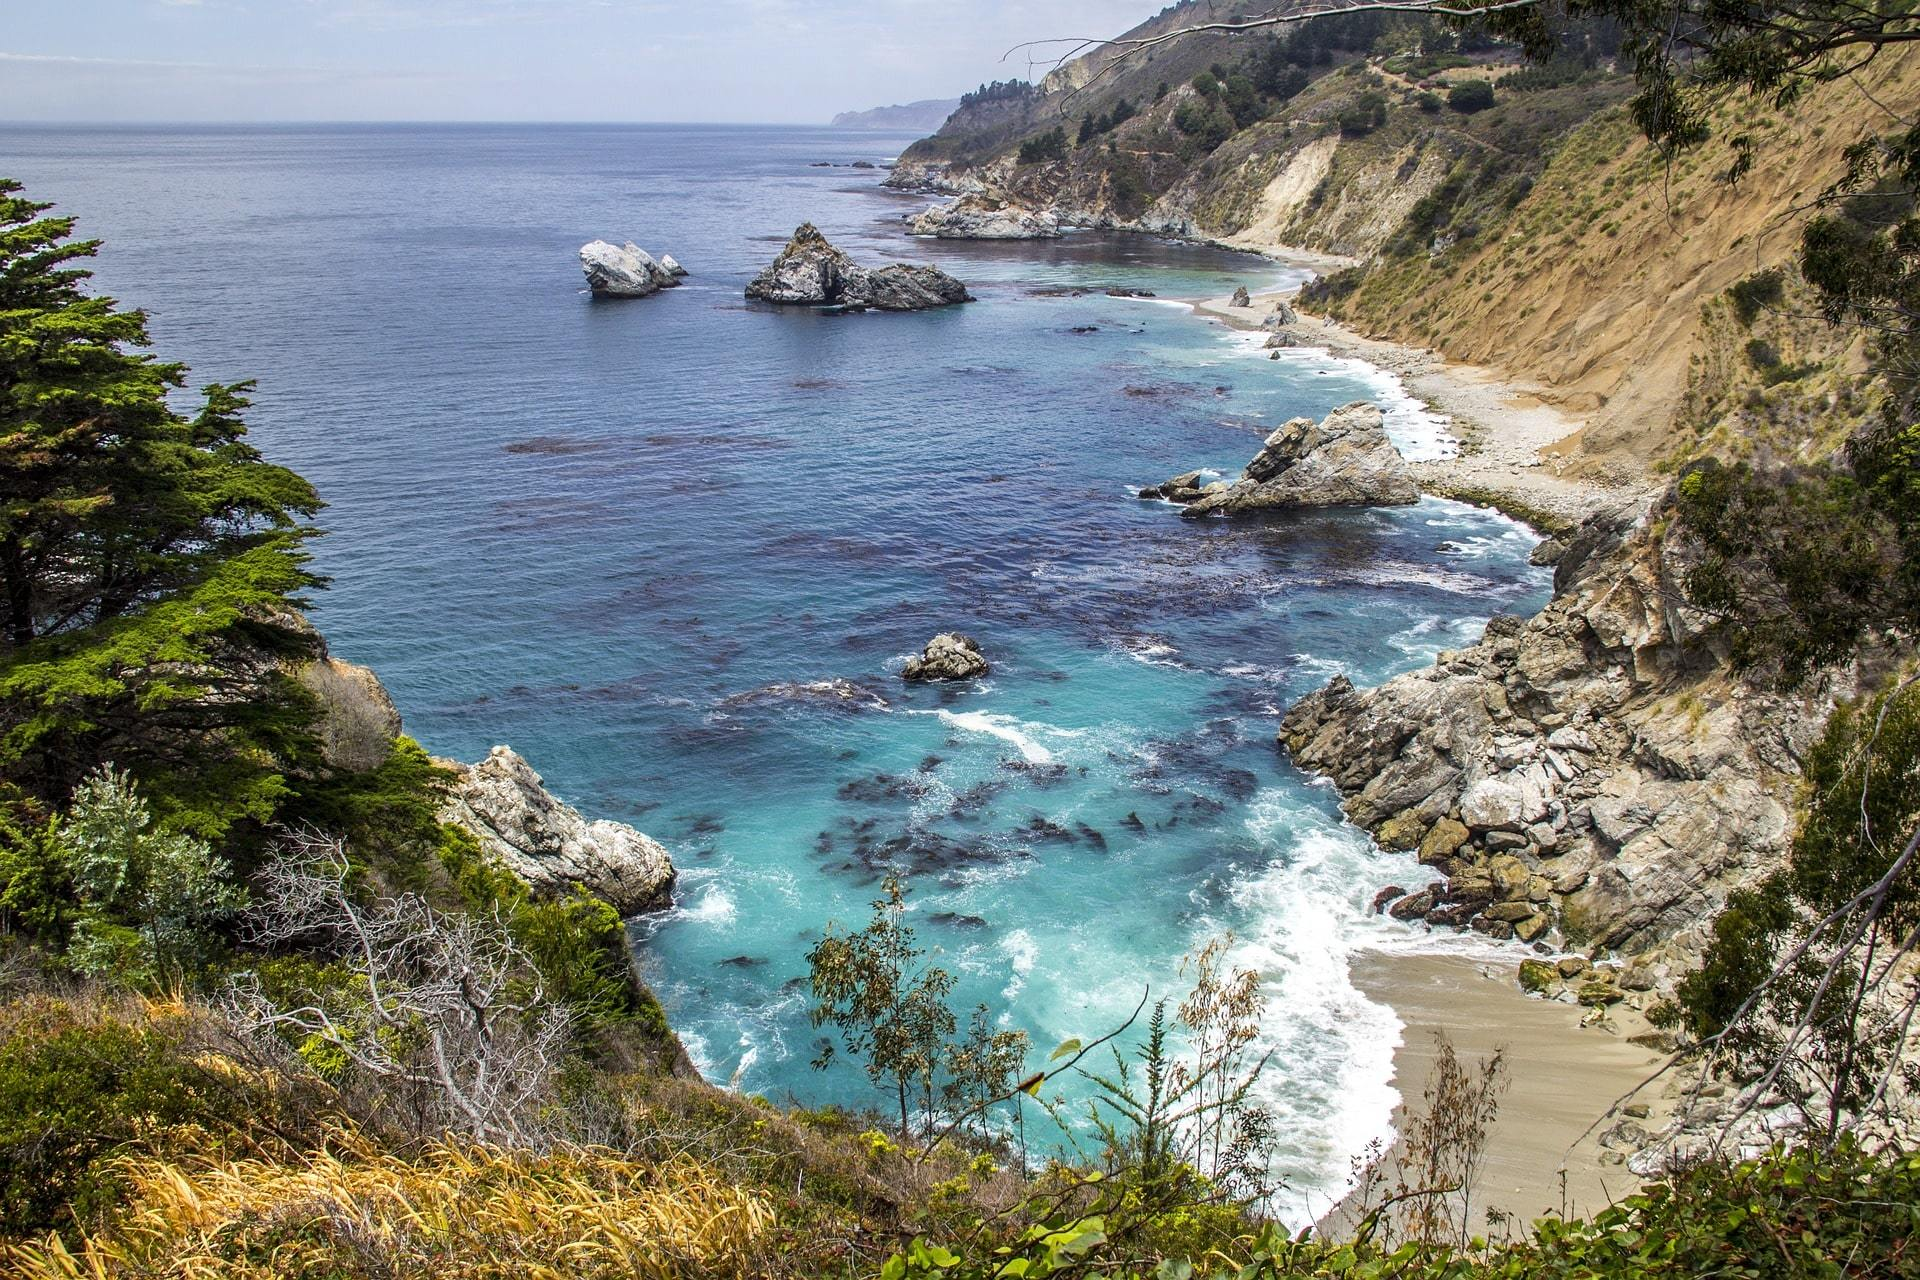 ocean with rocks on california coast